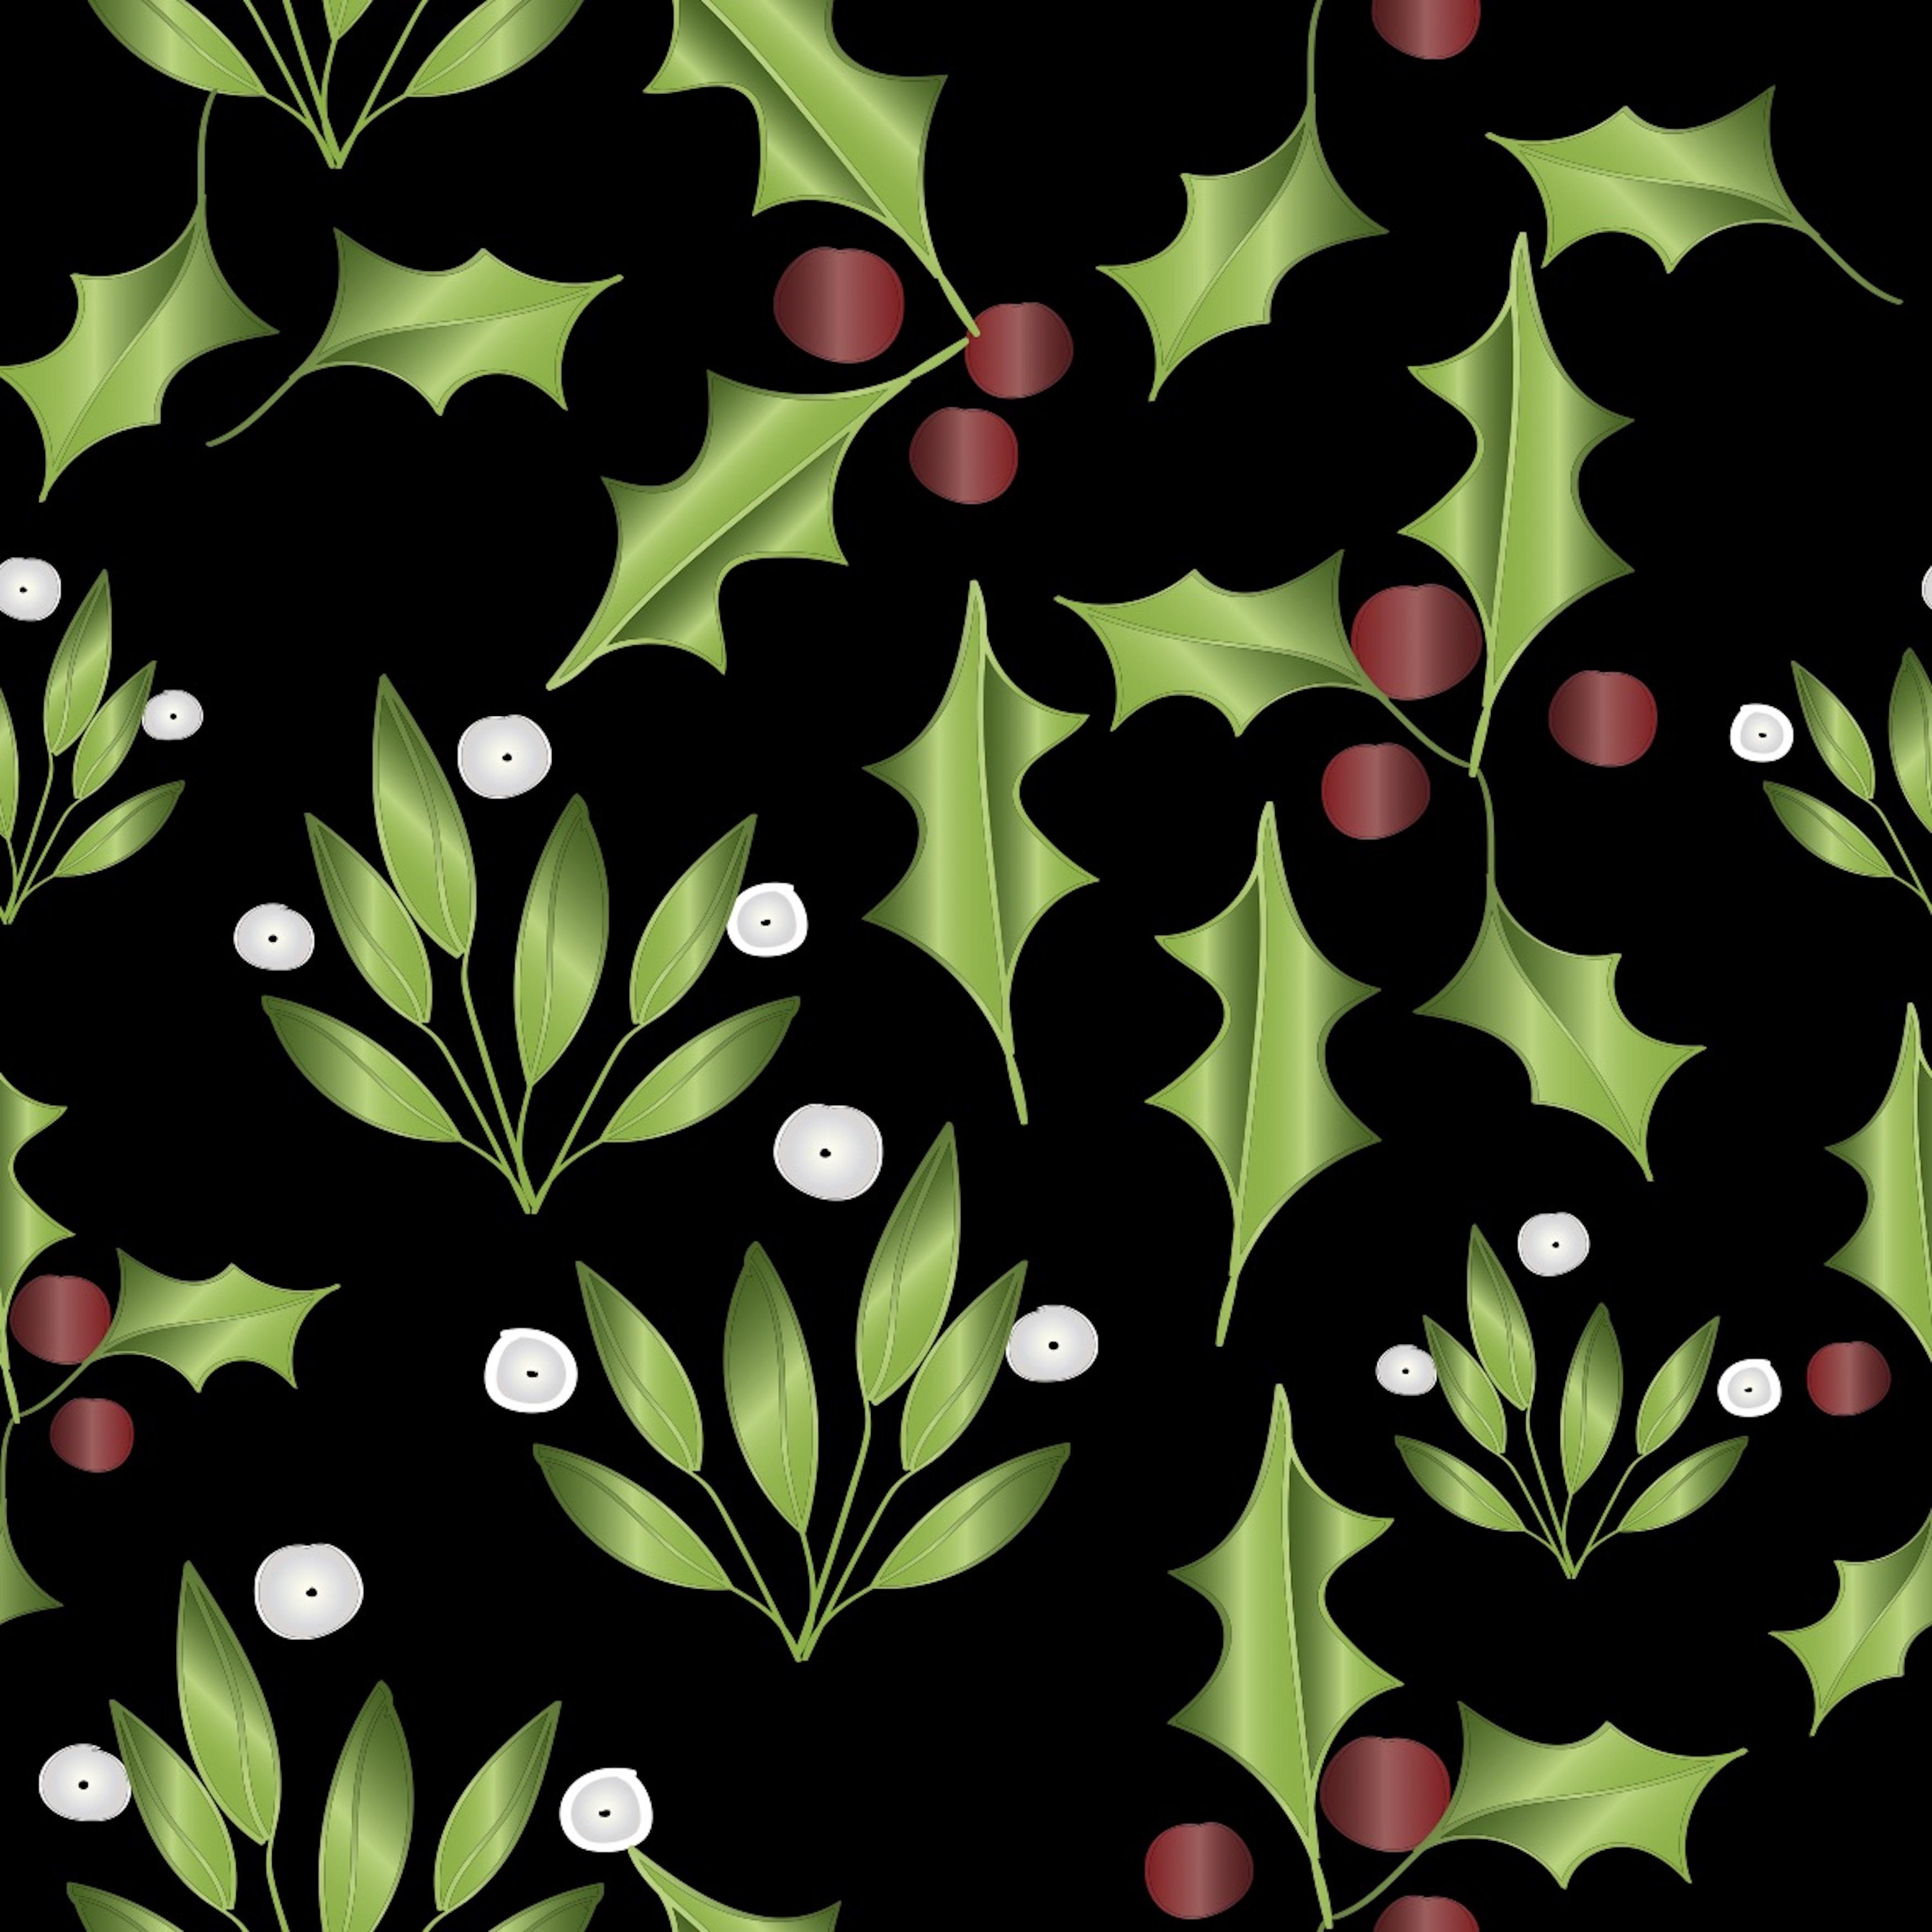 Mistletoe and Ilex